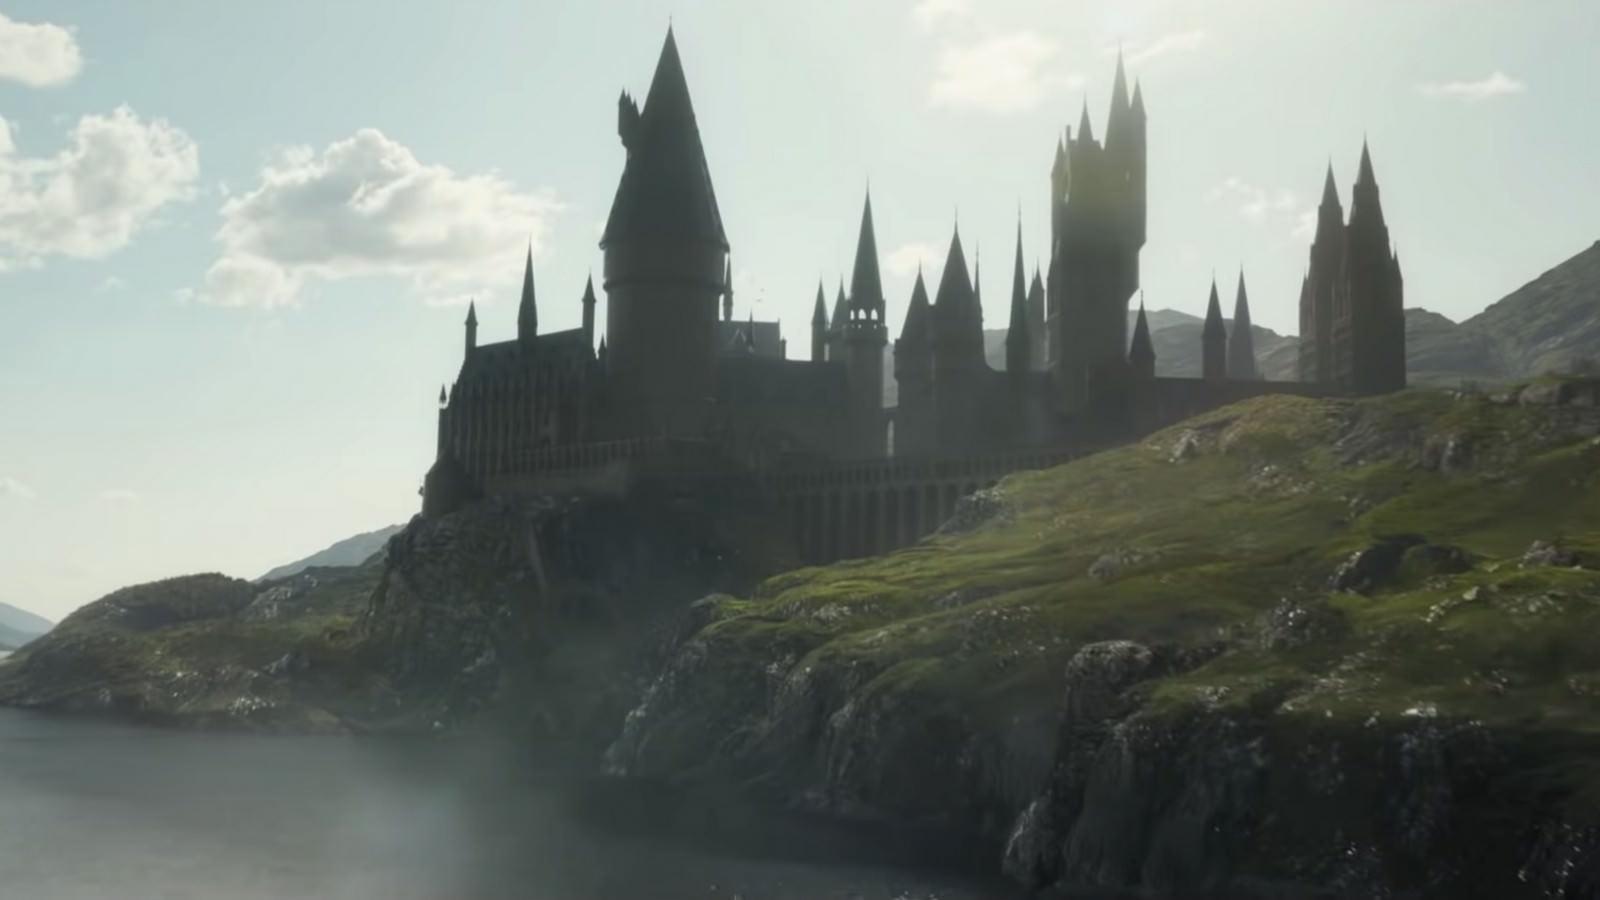 Movie, Fantastic Beasts: The Crimes of Grindelwald(美國, 2018年) / 怪獸與葛林戴華德的罪行(台灣) / 神奇动物:格林德沃之罪(中國) / 怪獸與葛林戴華德之罪(香港), 電影劇照